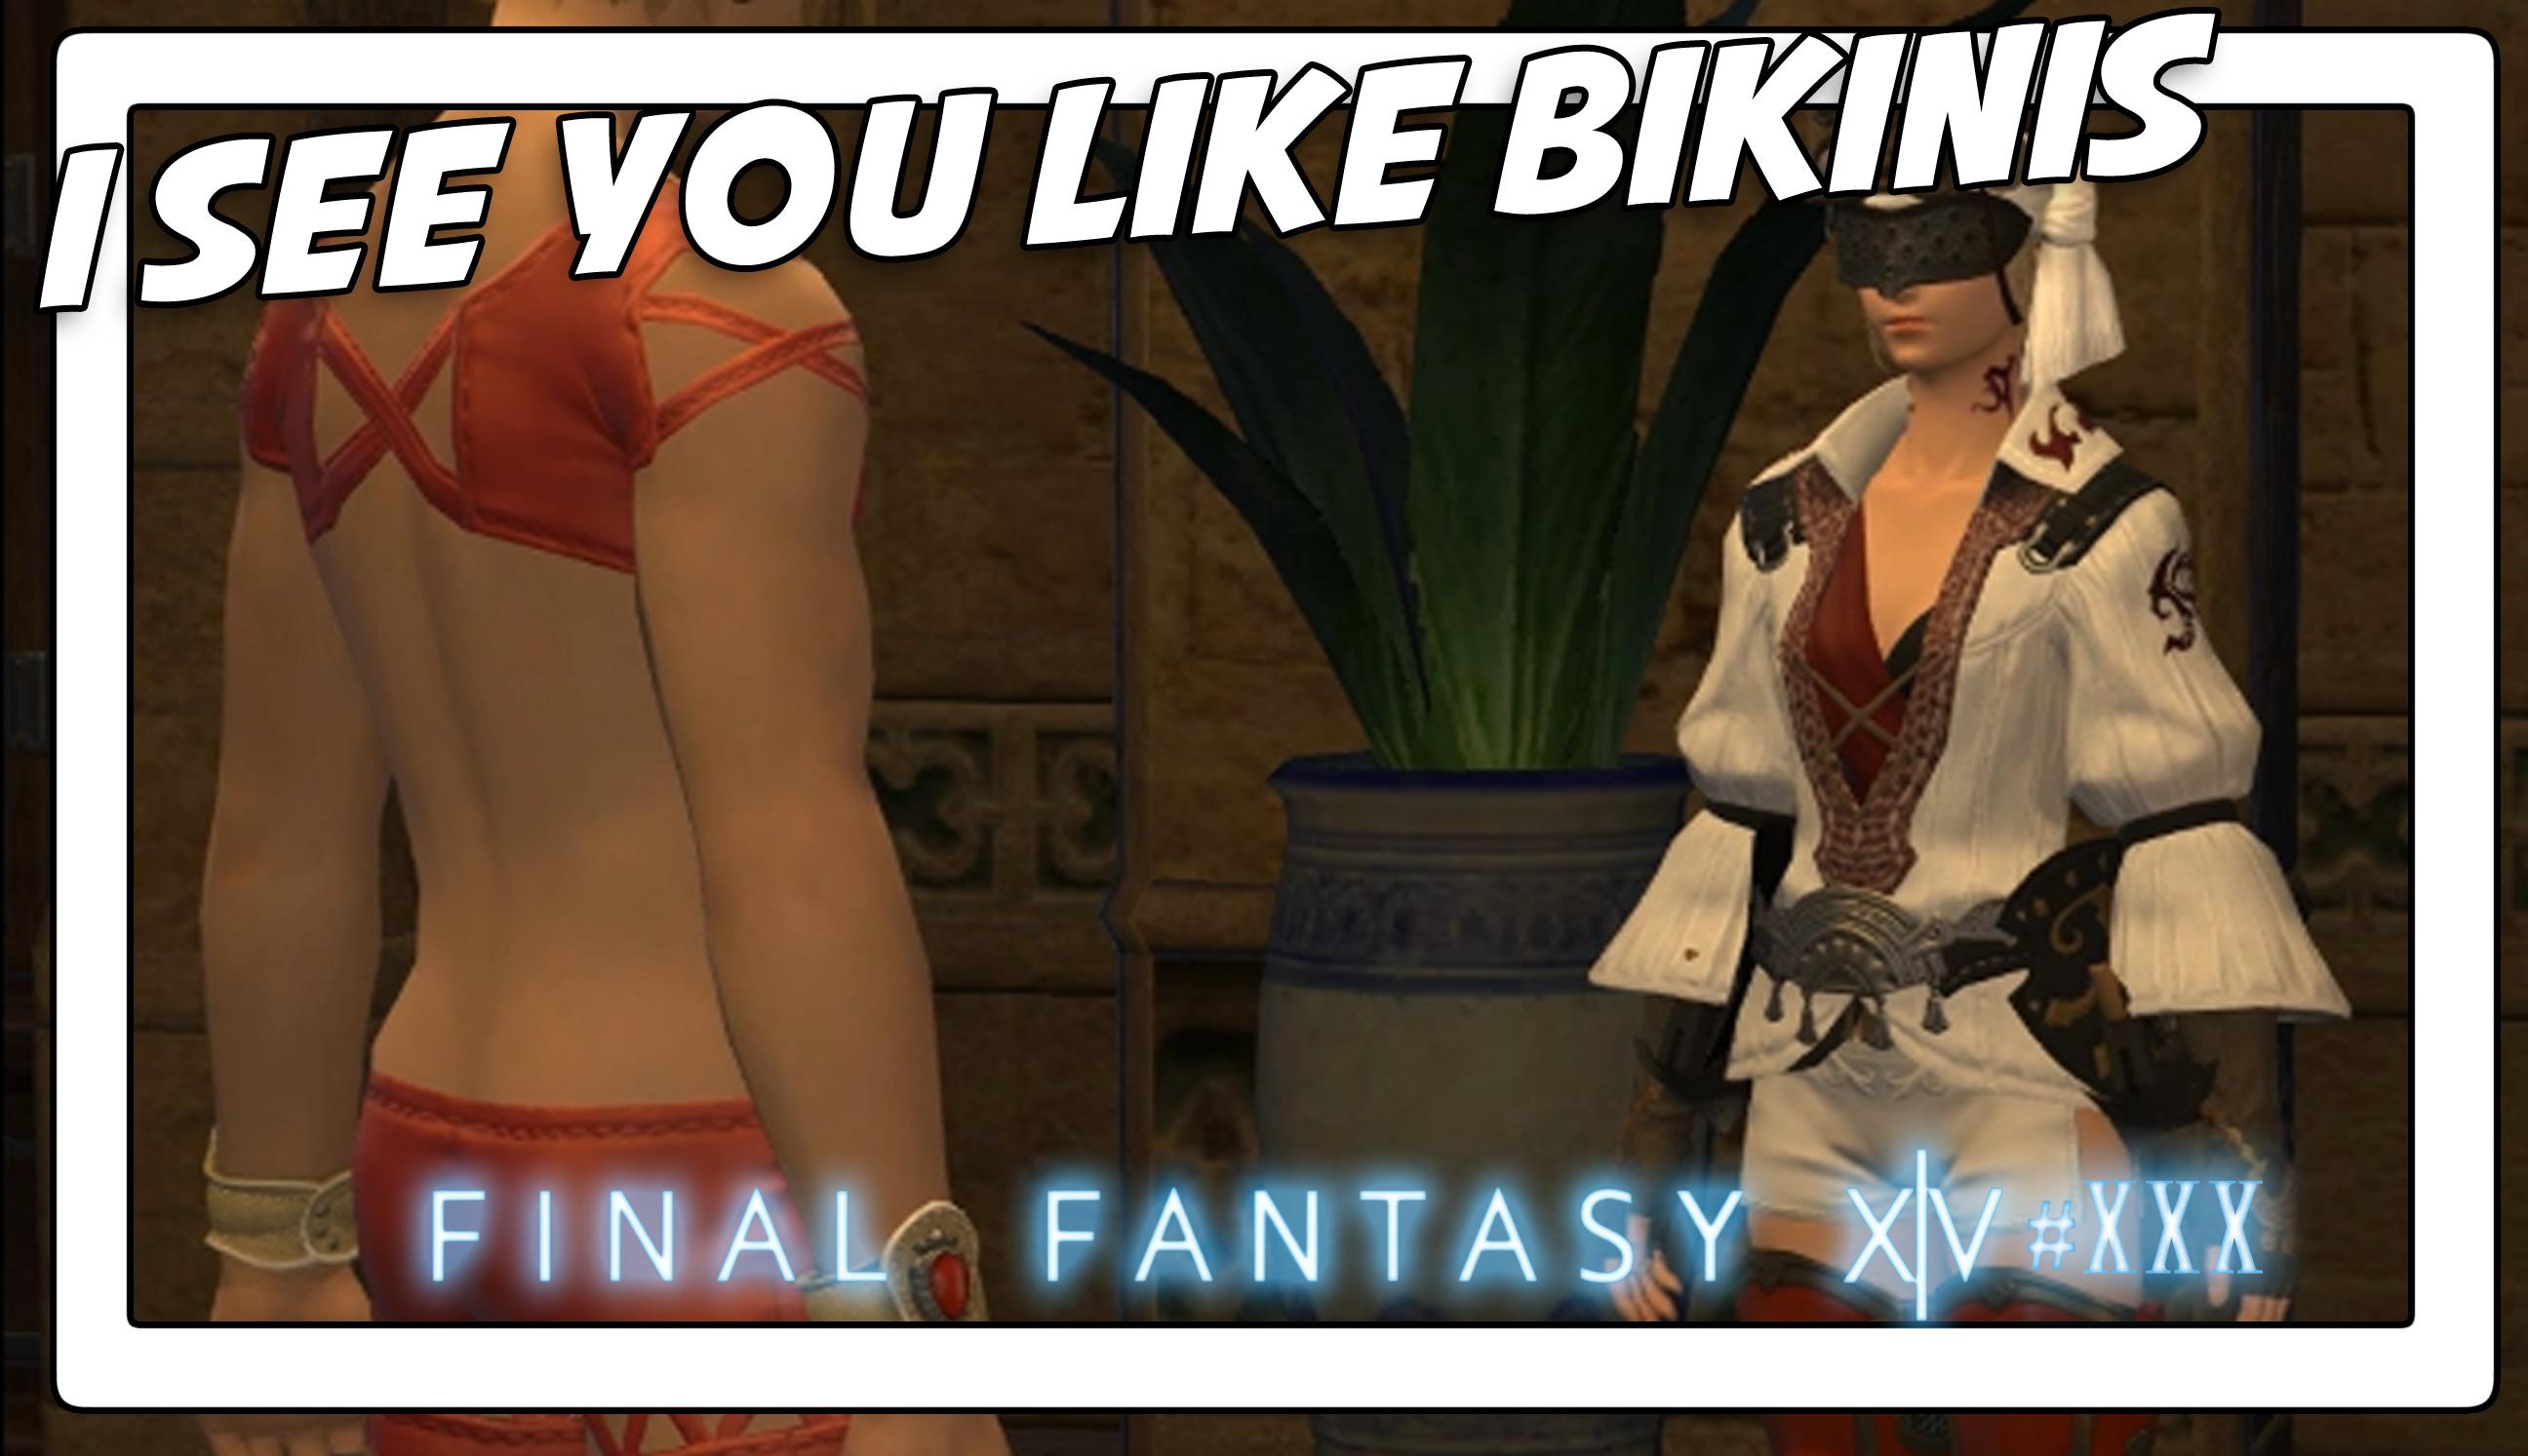 Final fantasy 14 porn sex clip